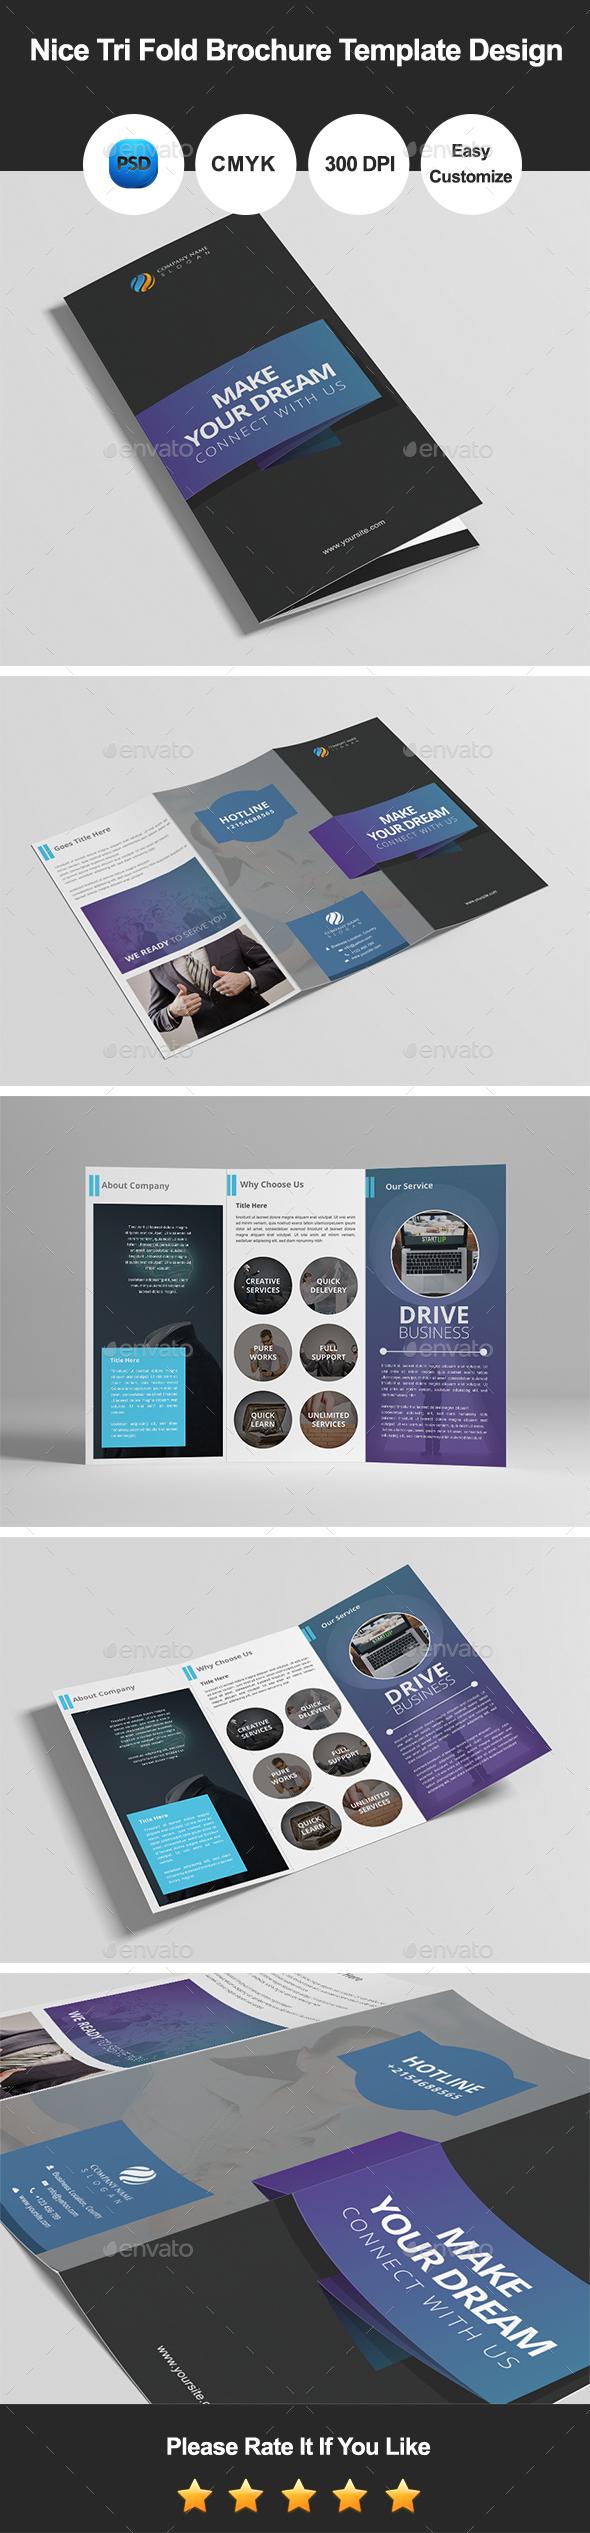 Nice Tri Fold Brochure Template Design - Informational Brochures